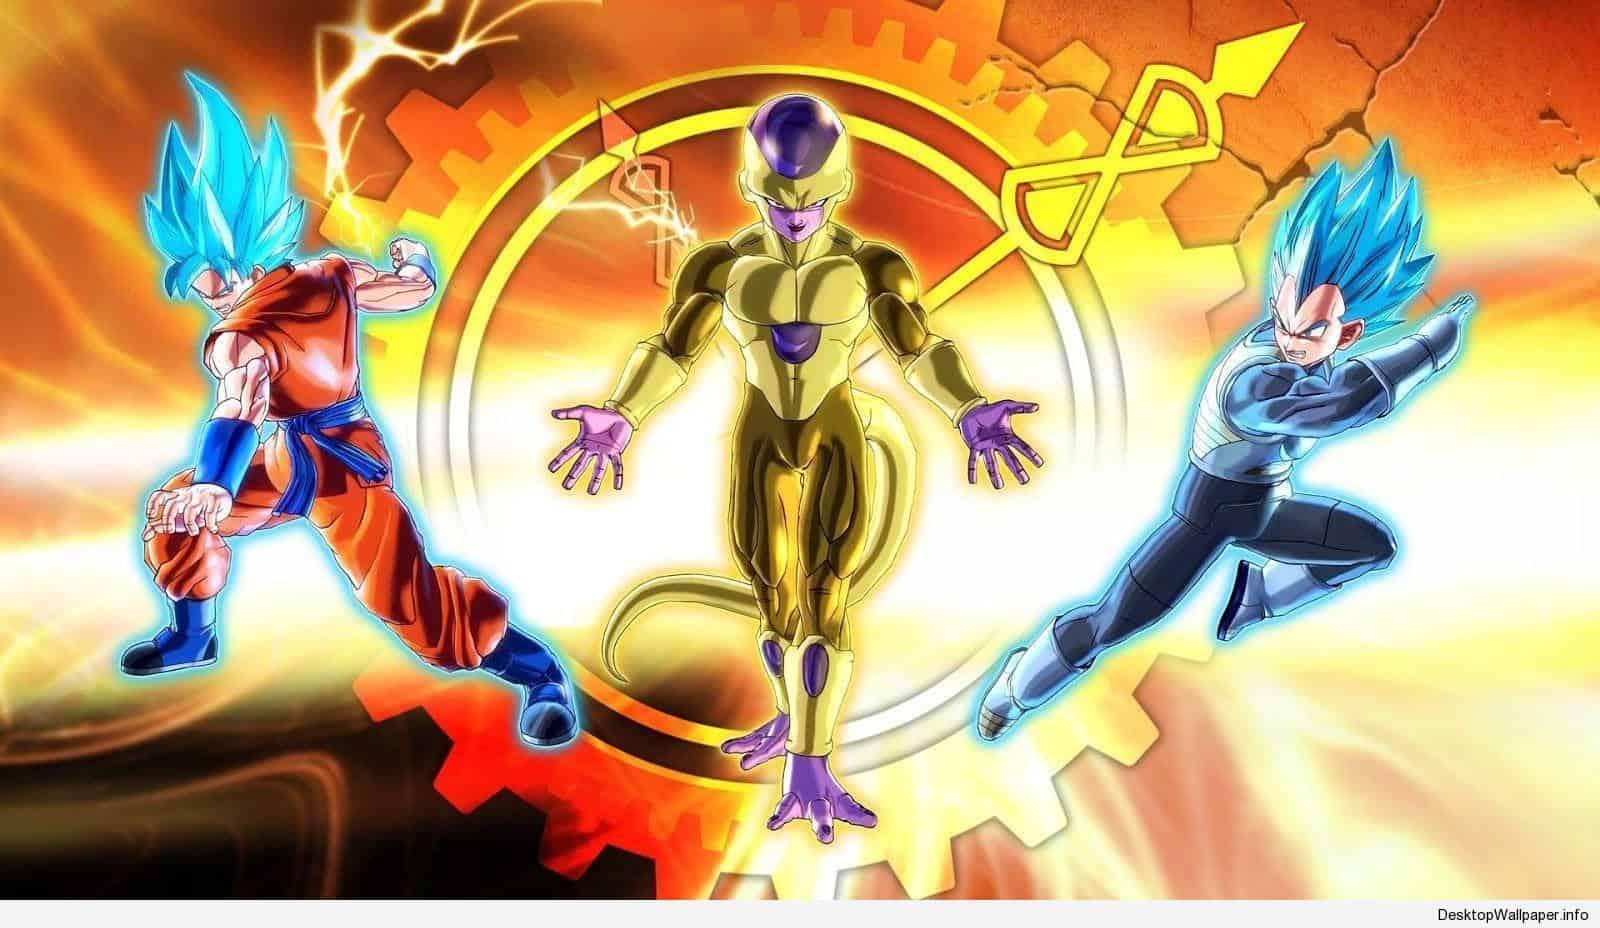 Super Dragon Ball Wallpapers Top Free Super Dragon Ball